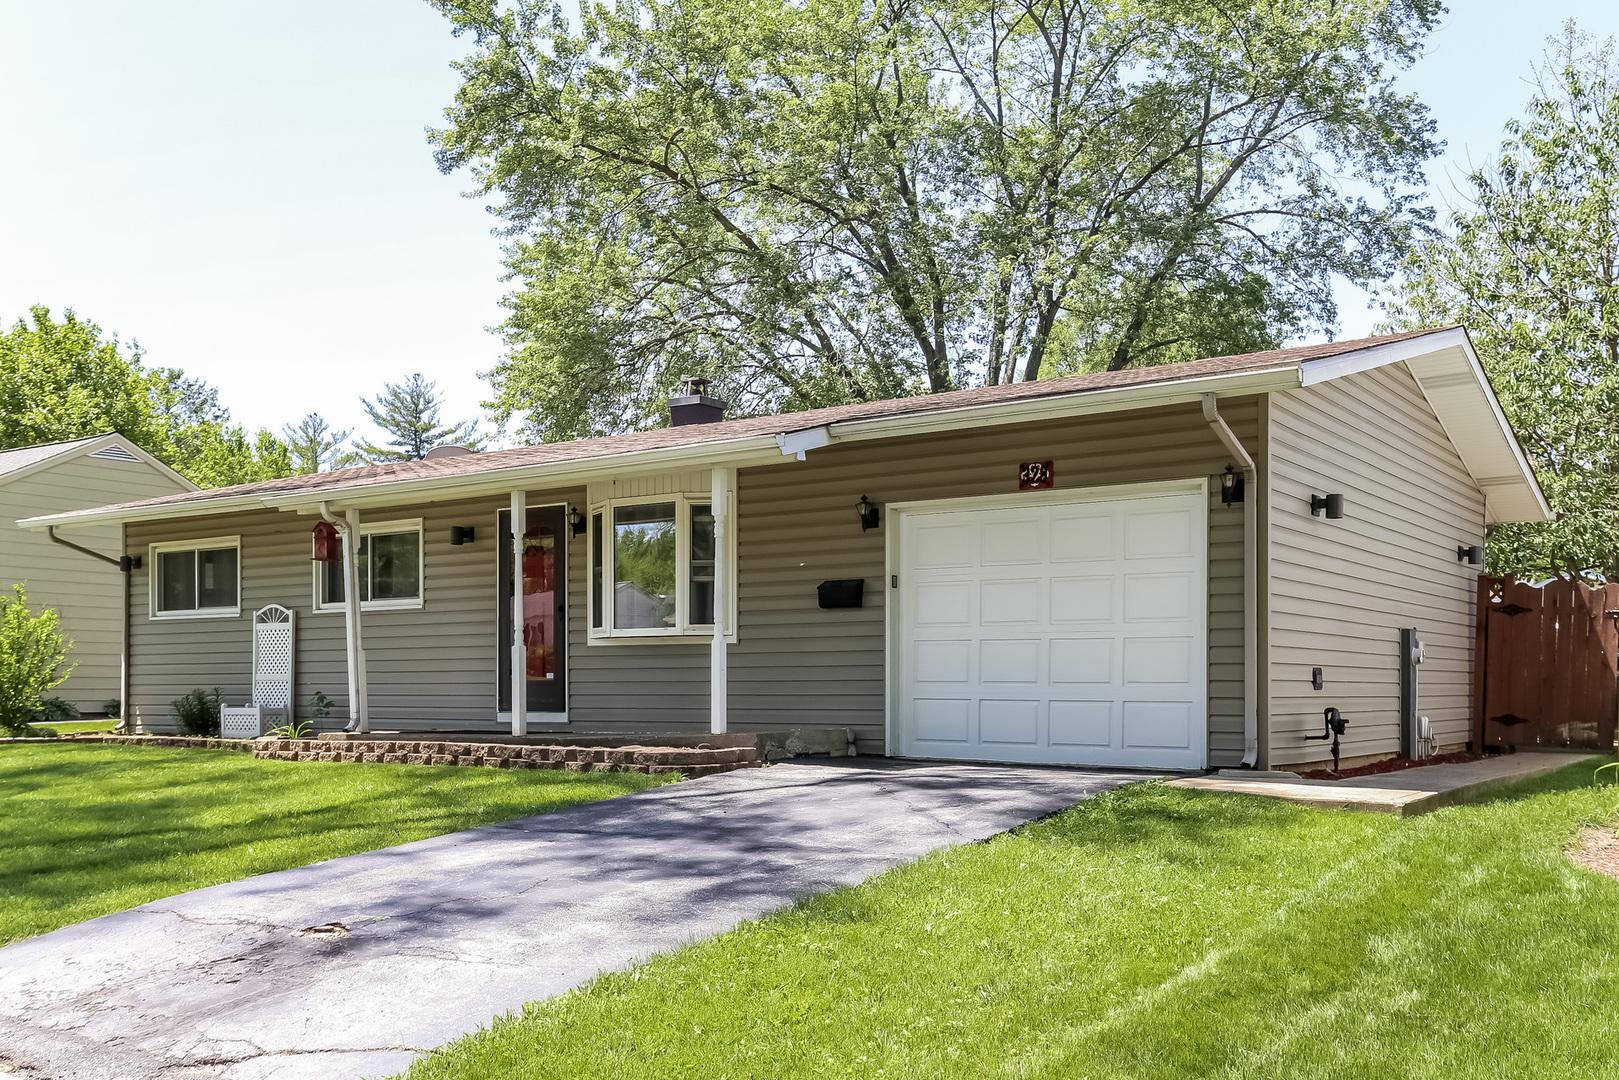 328 Melinda Lane, Buffalo Grove, Illinois 60089